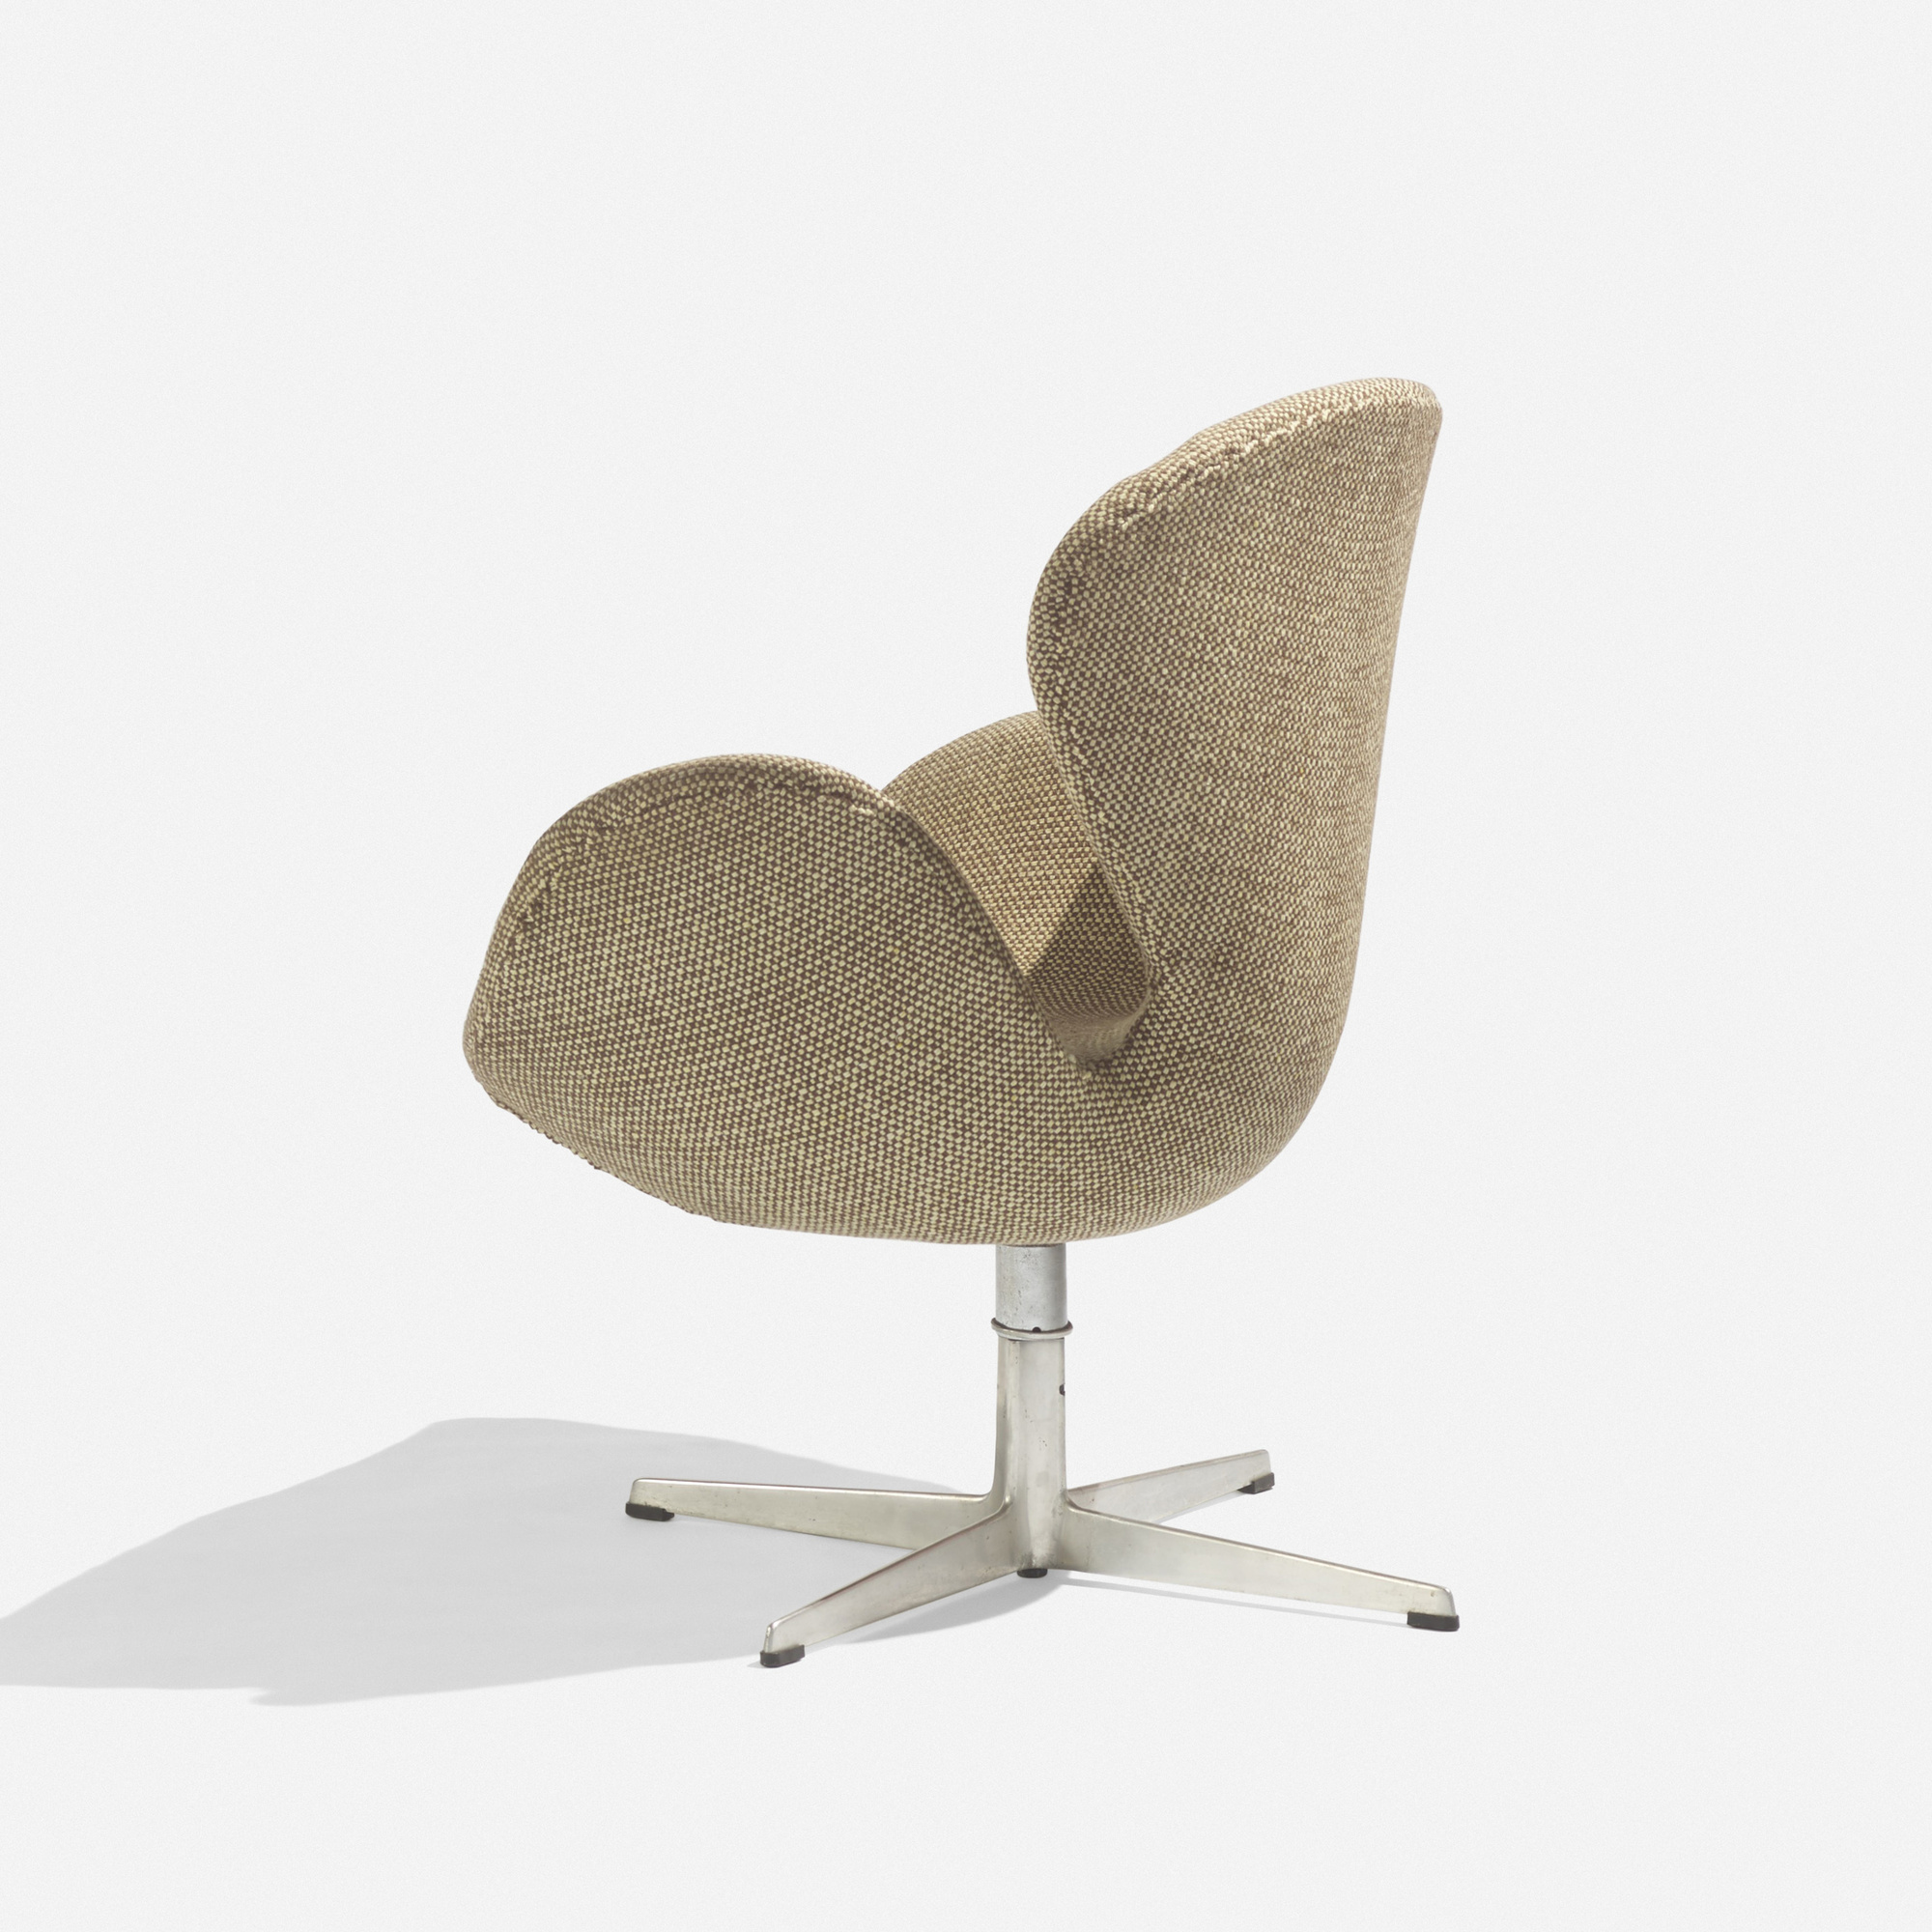 Ordinaire ... 220: Arne Jacobsen / Swan Chair (3 Of 3)